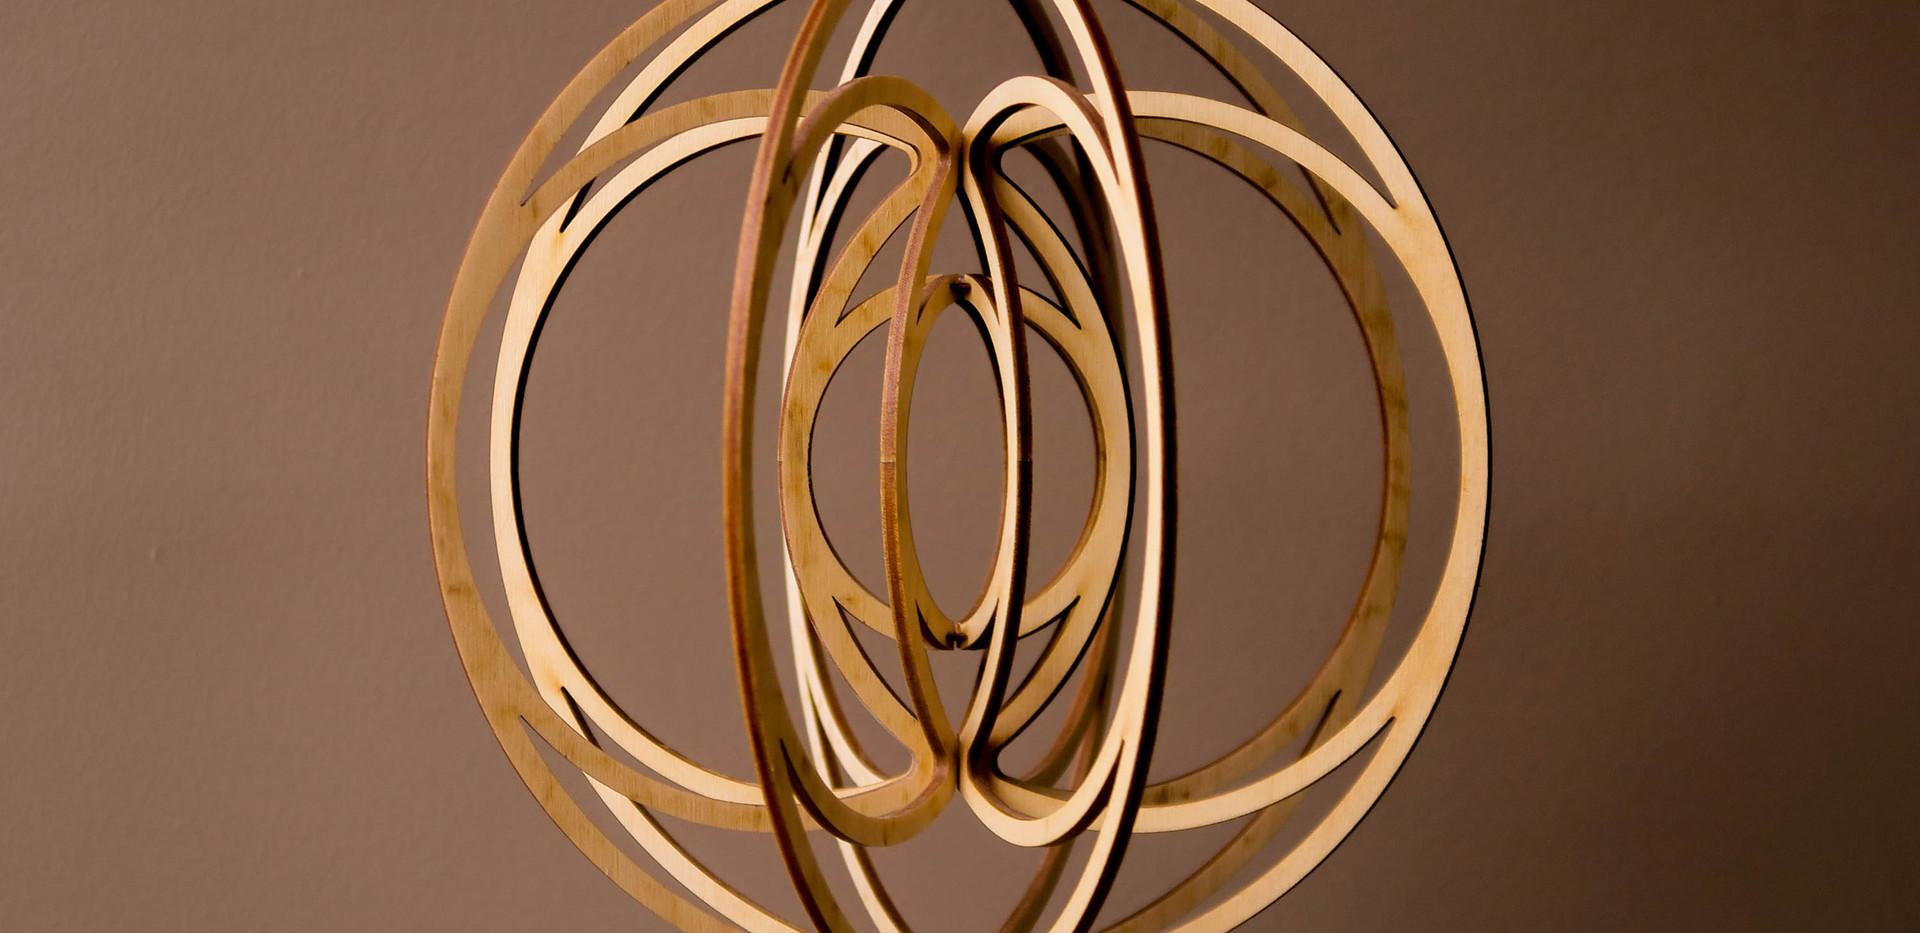 Circles in Circles n1 - medium